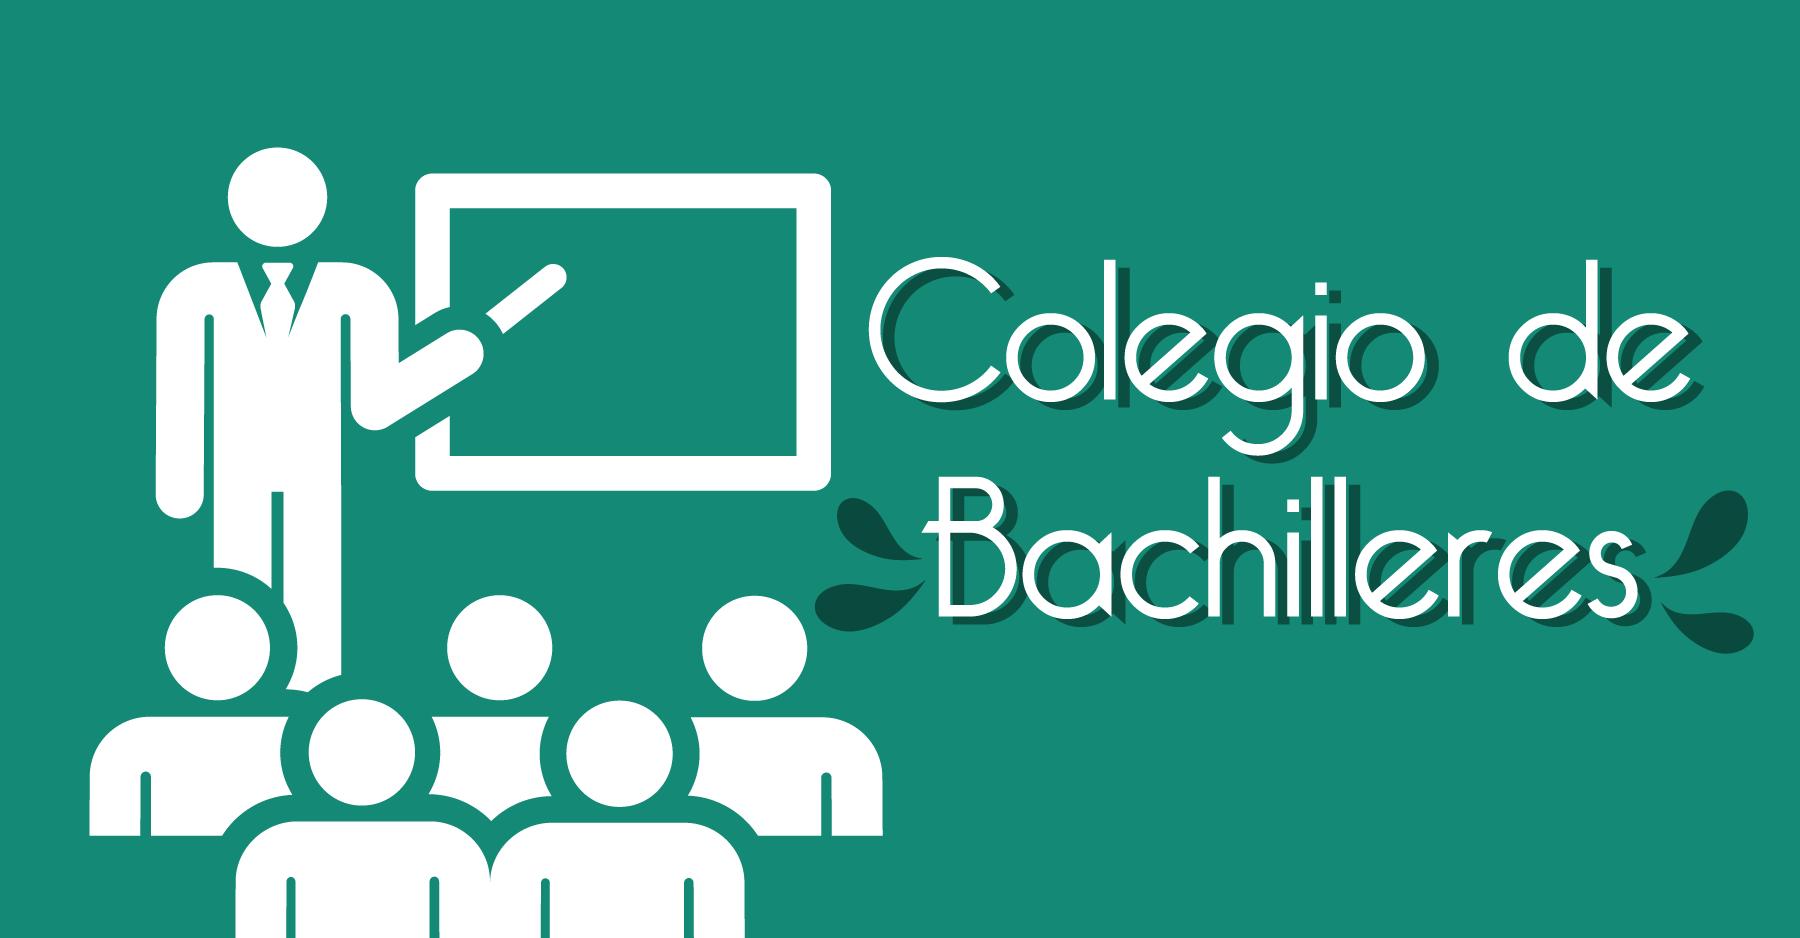 Colegiodebachilleres2